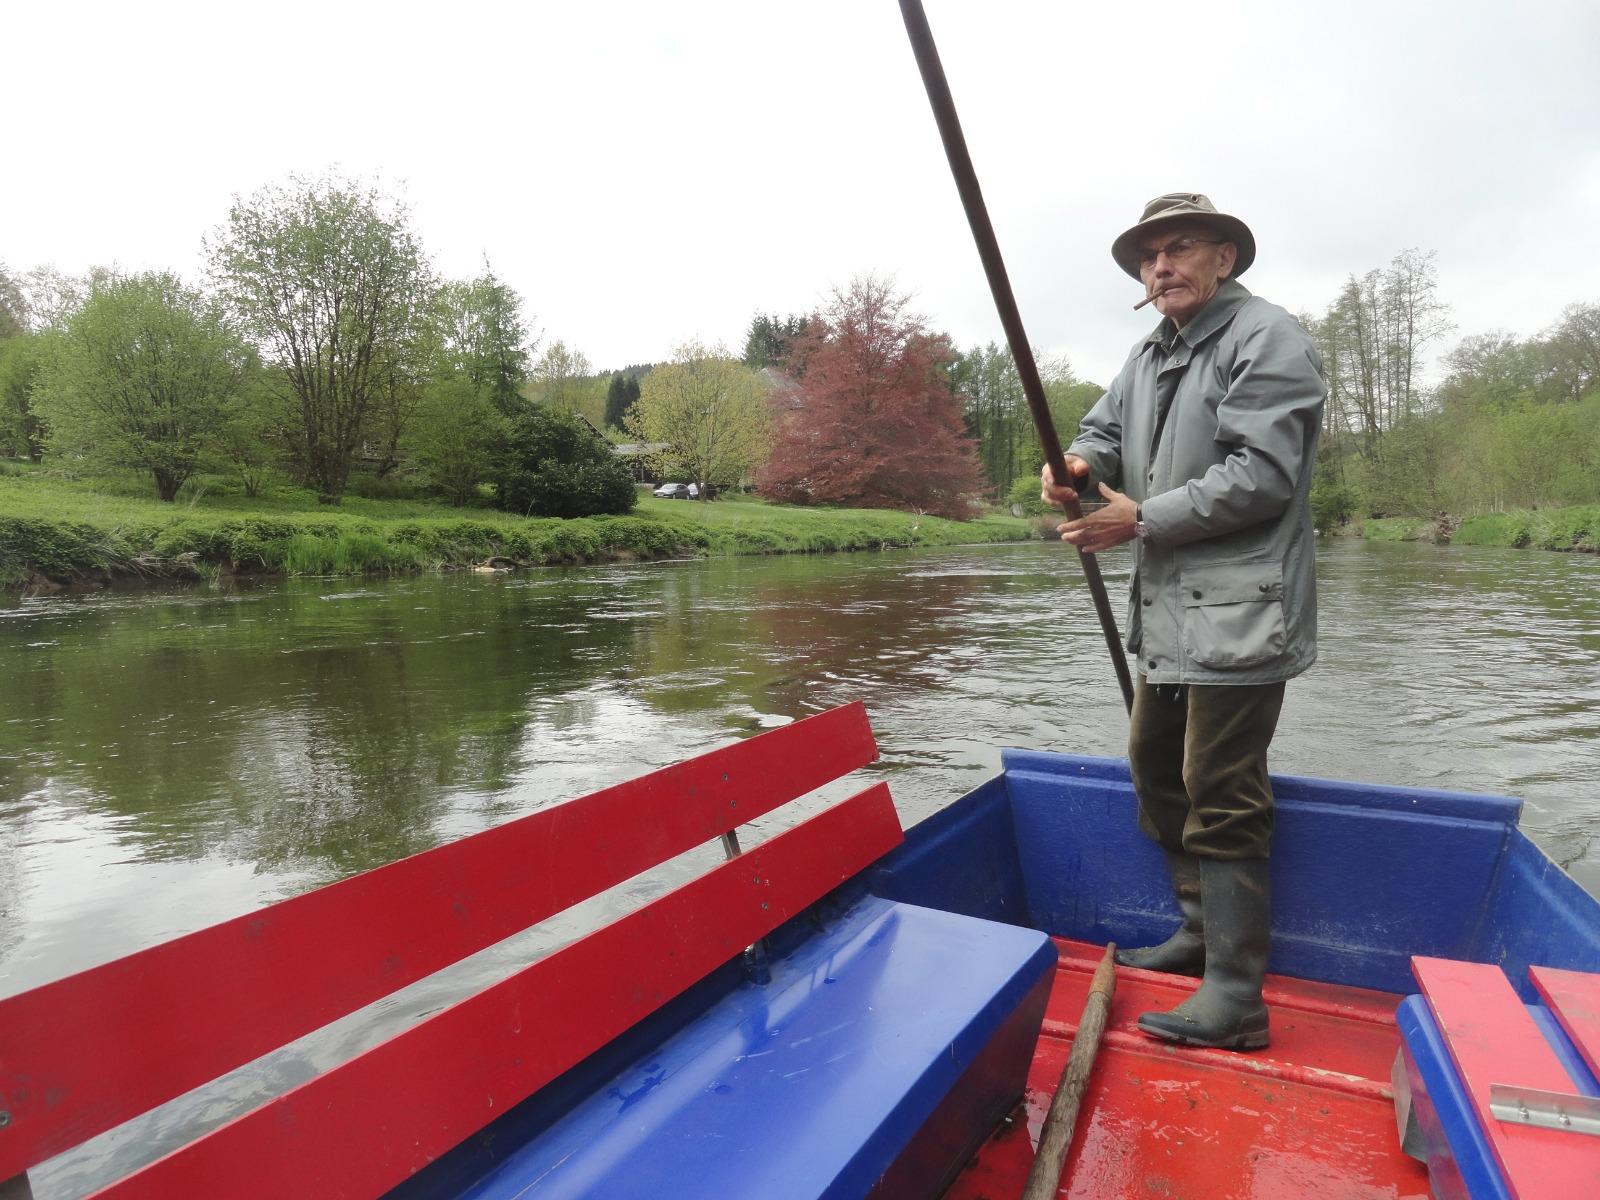 Chiny gite Embarcadere 56 Ignace Derulle barque Passeurs Réunis Semois